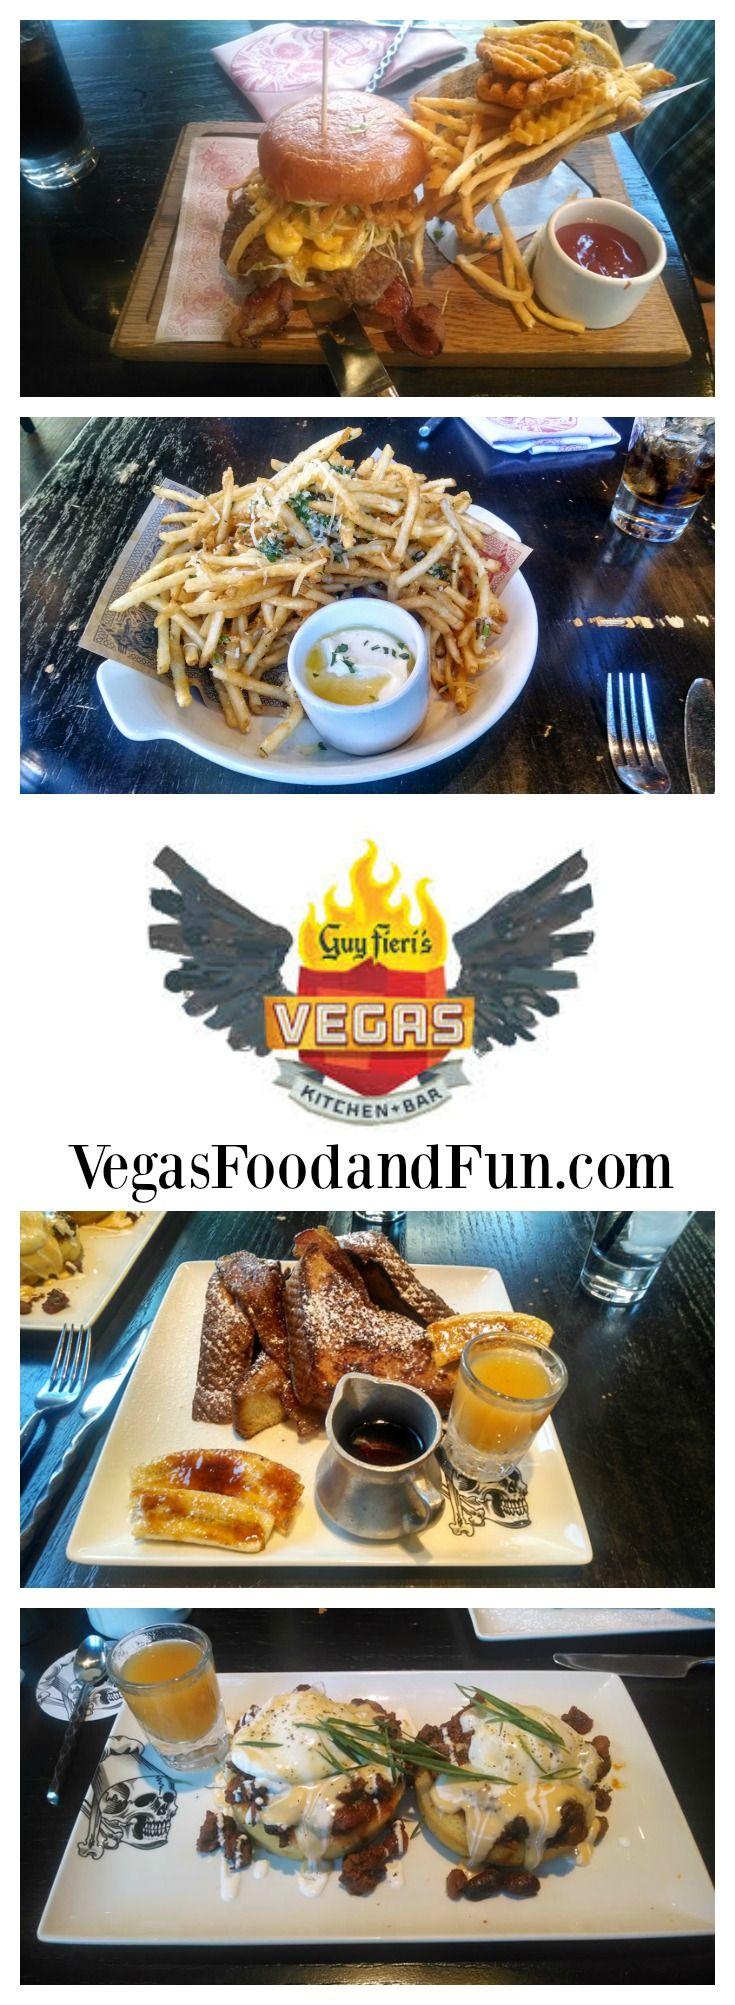 Guy Fieri's Restaurant in Las Vegas Prices, Menus, and Review